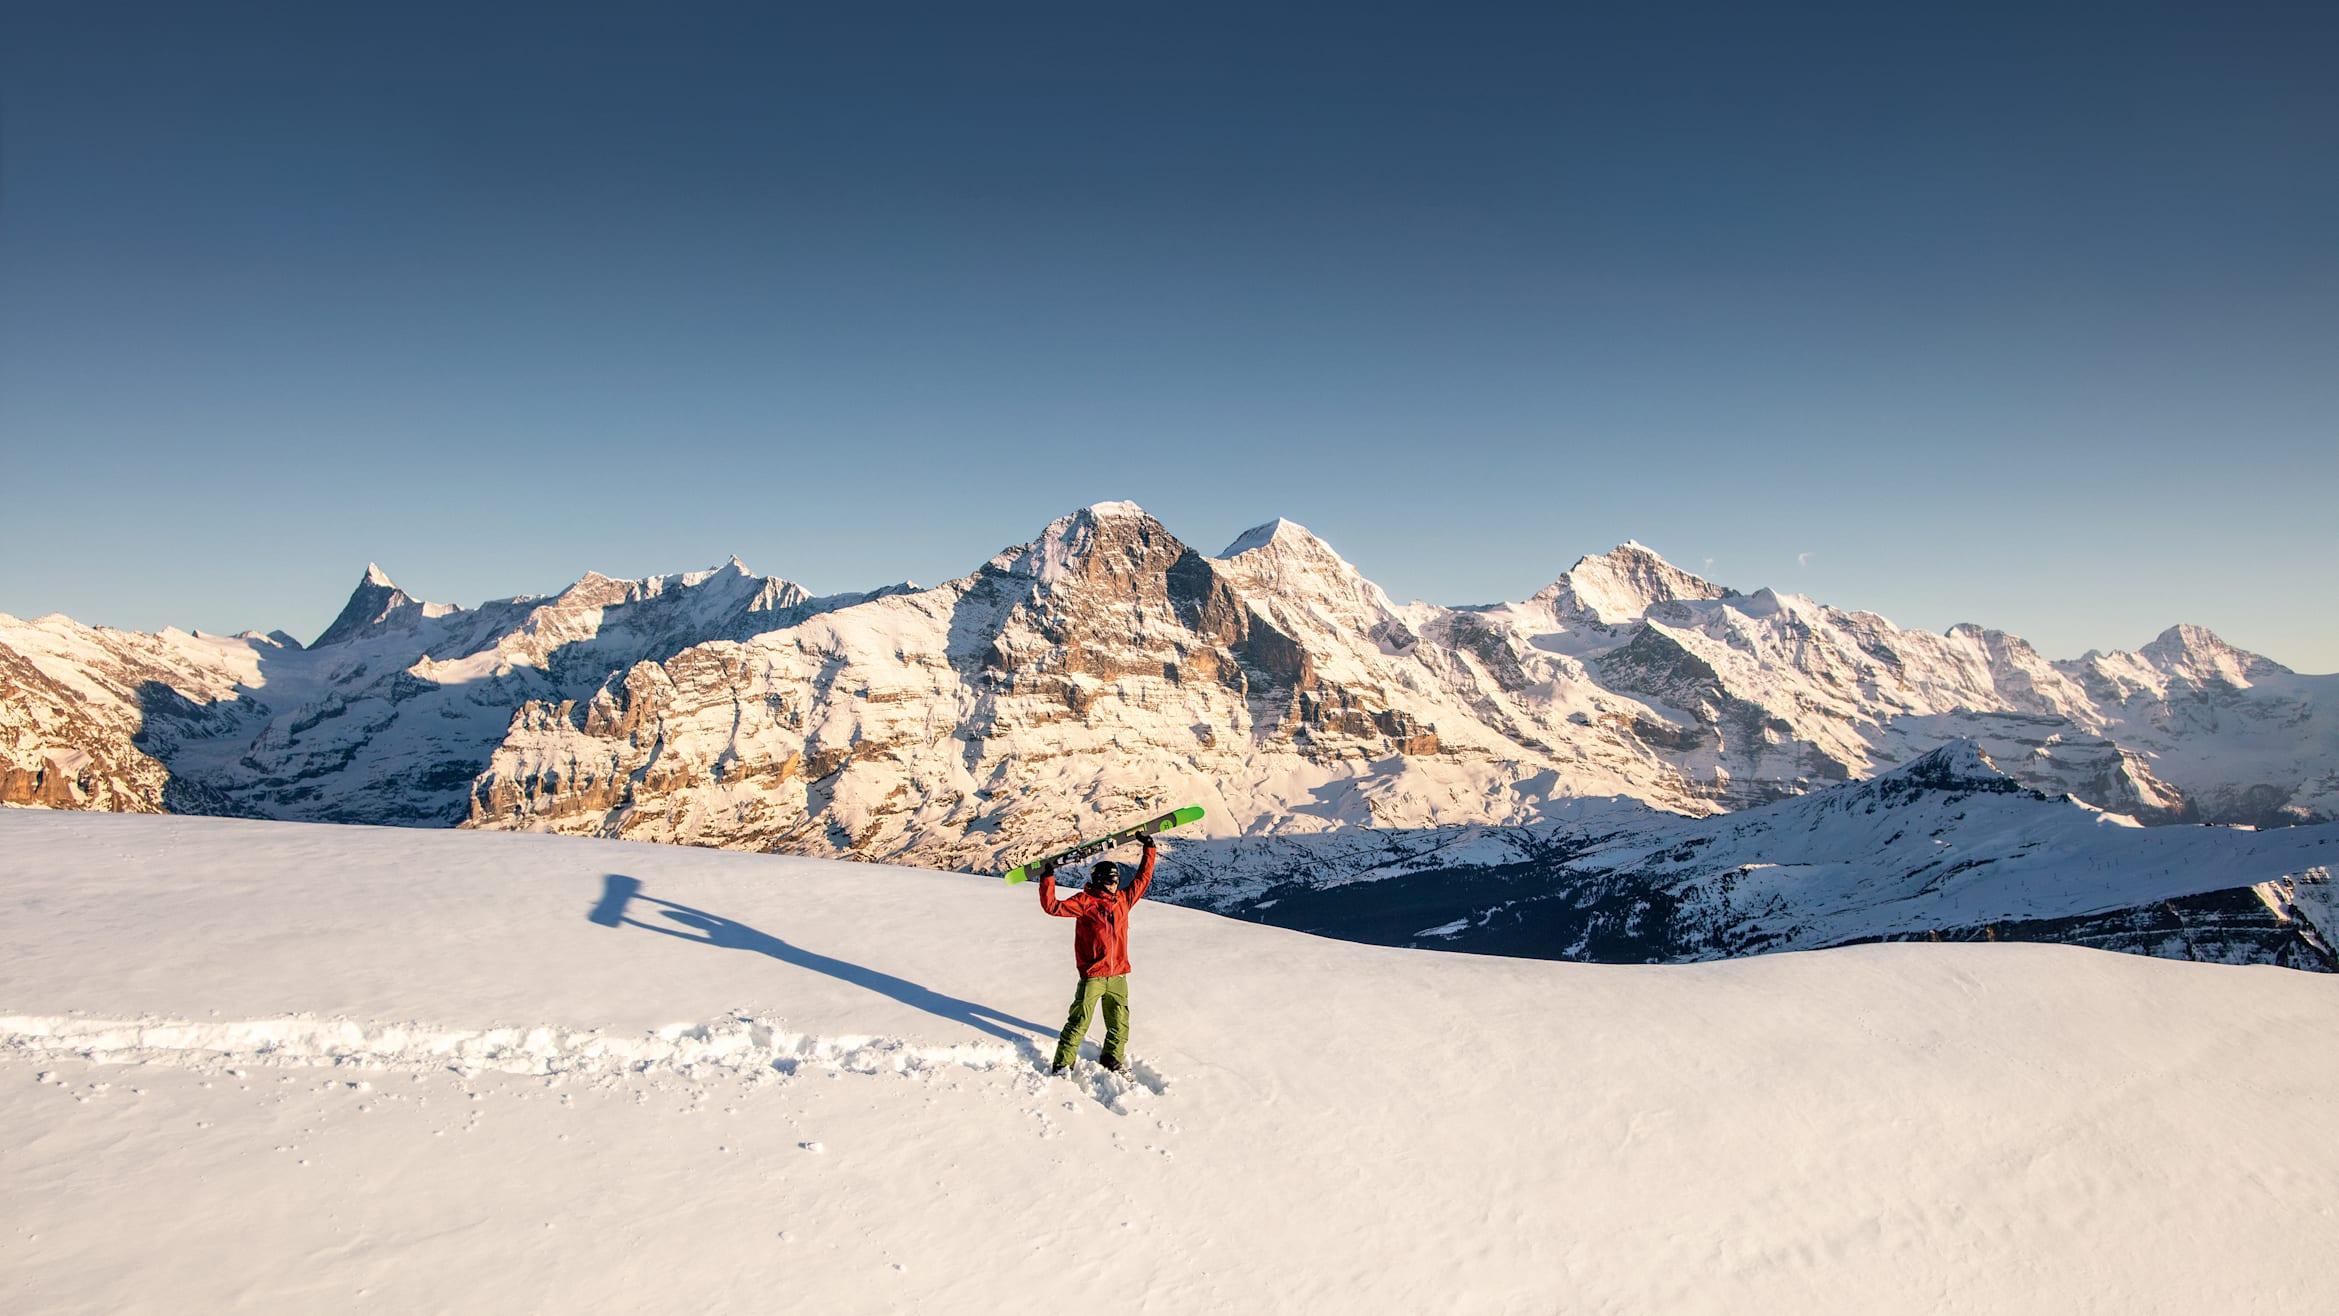 2020 Heroshot Ski View to the left Eiger Moench Jungfrau cmyk compressed